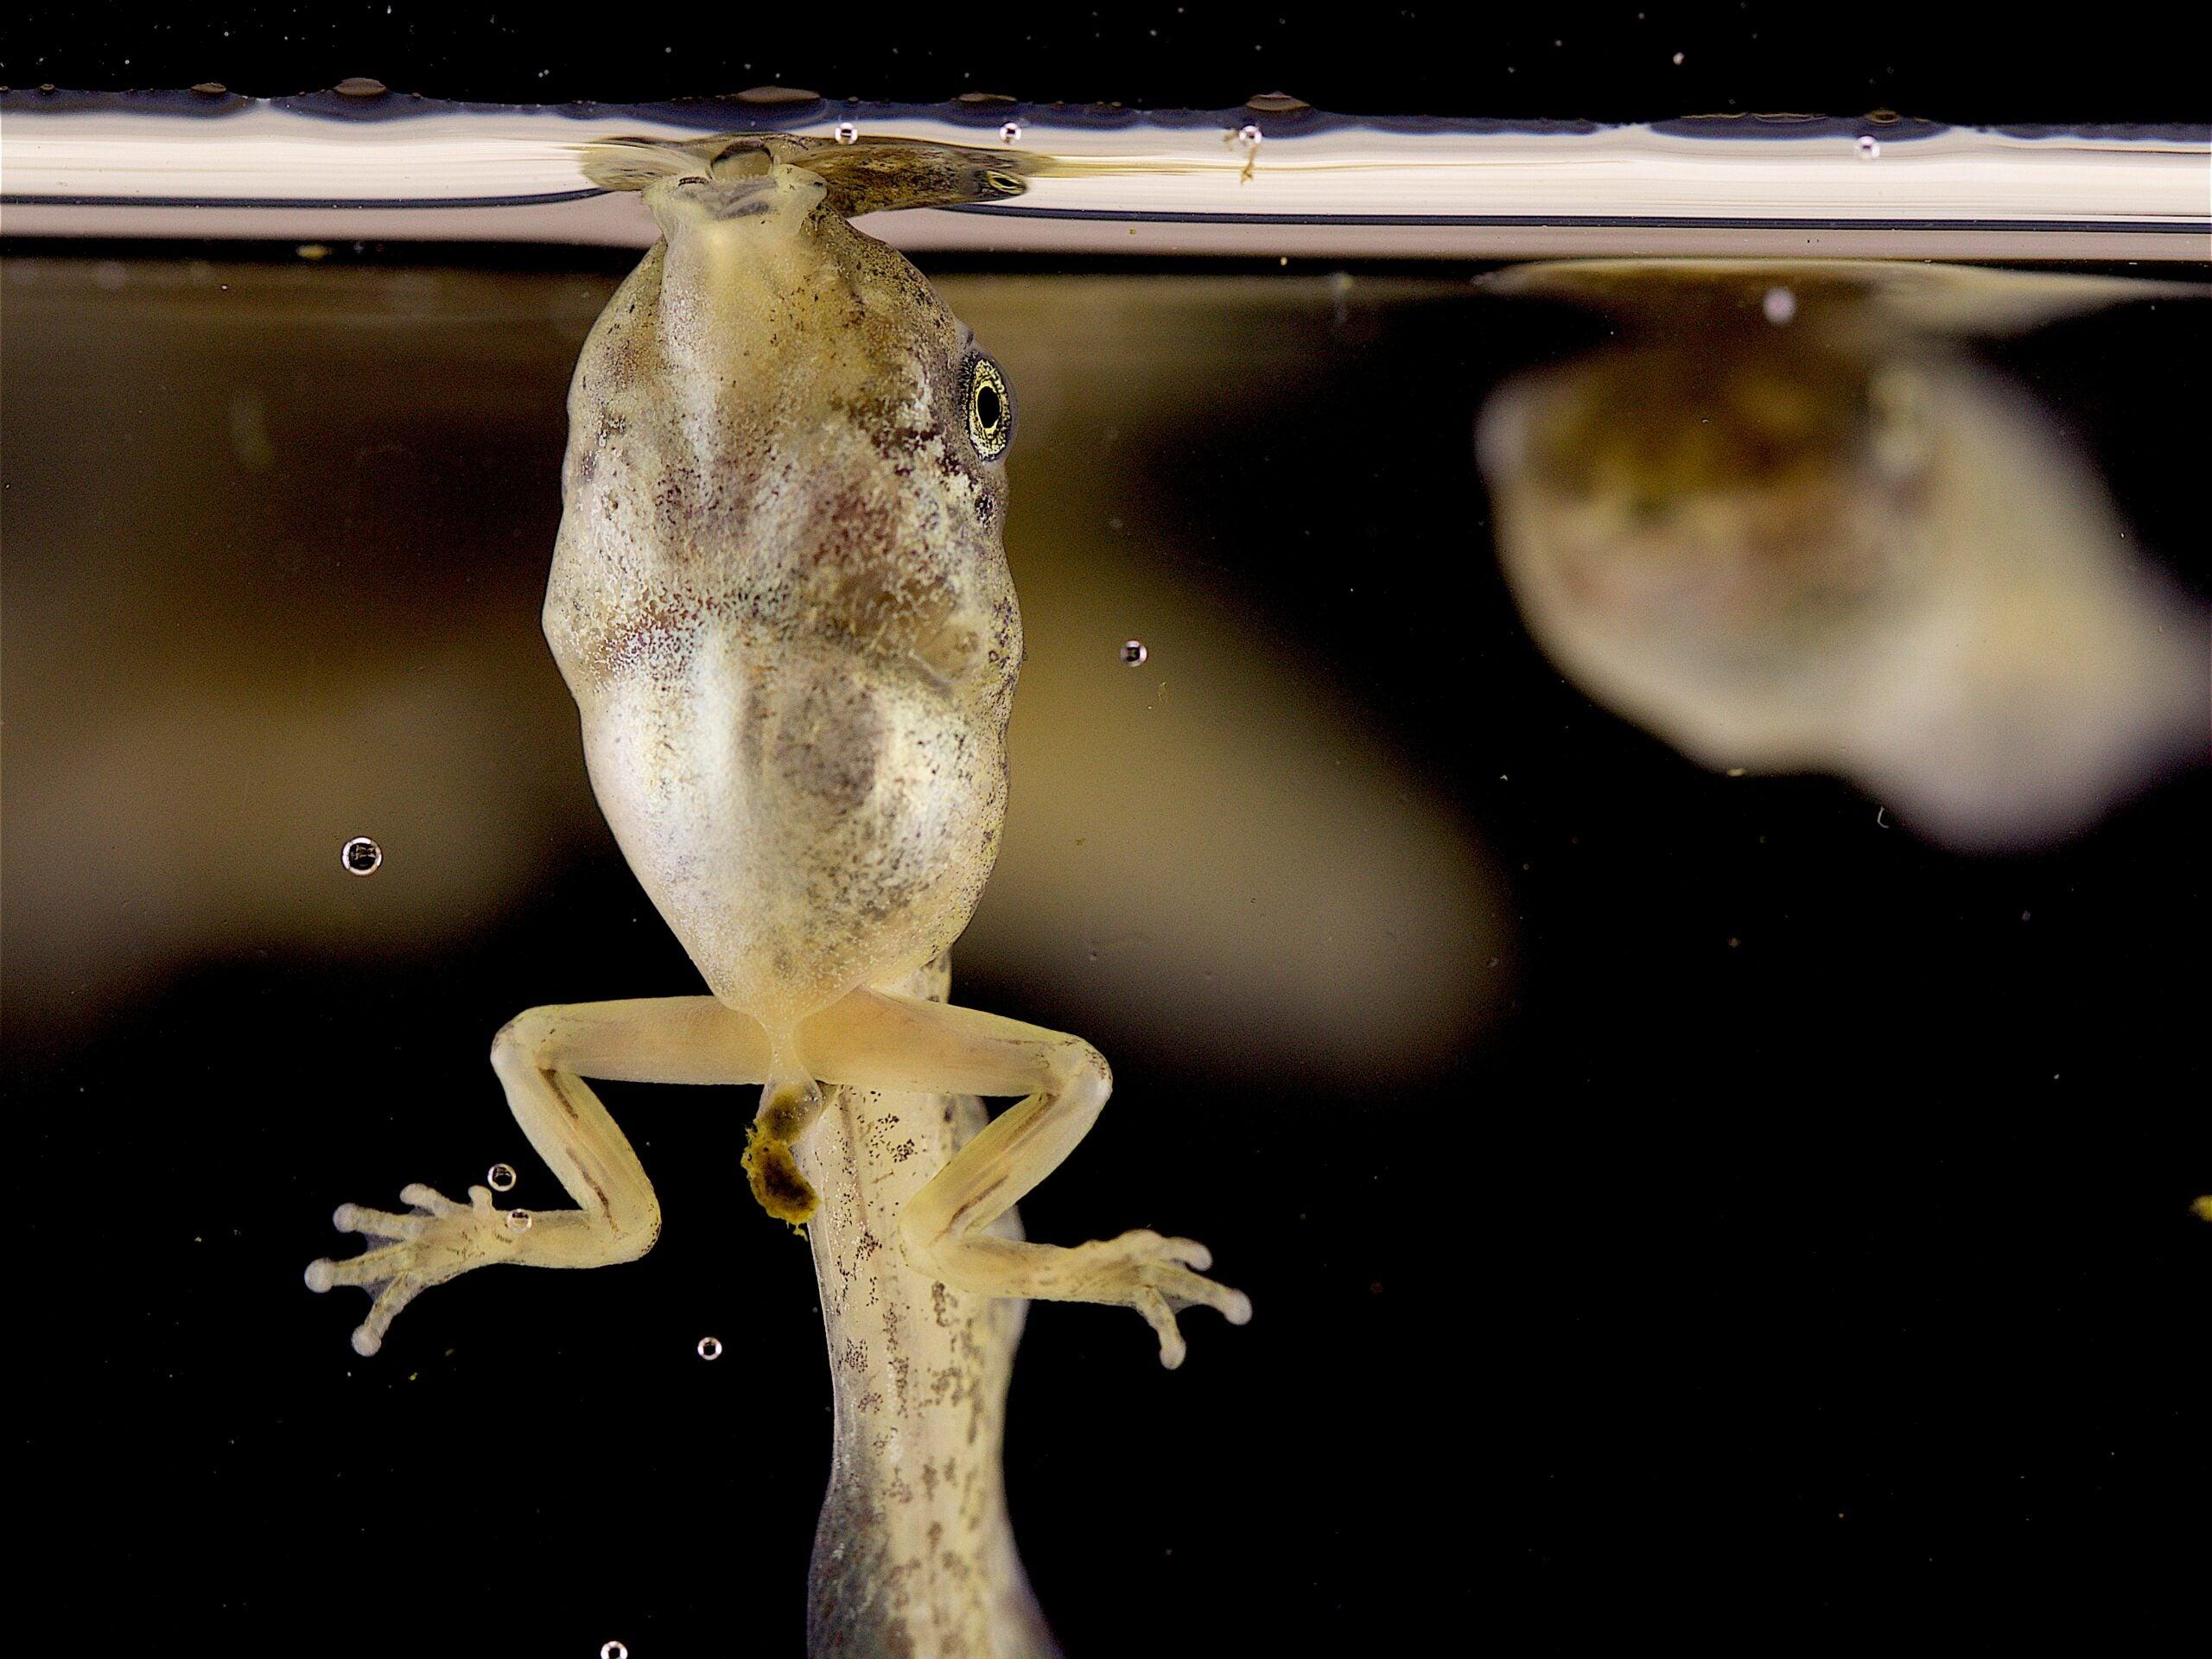 A tadpole of a gray tree frog sucks in a bubble full of oxygen.